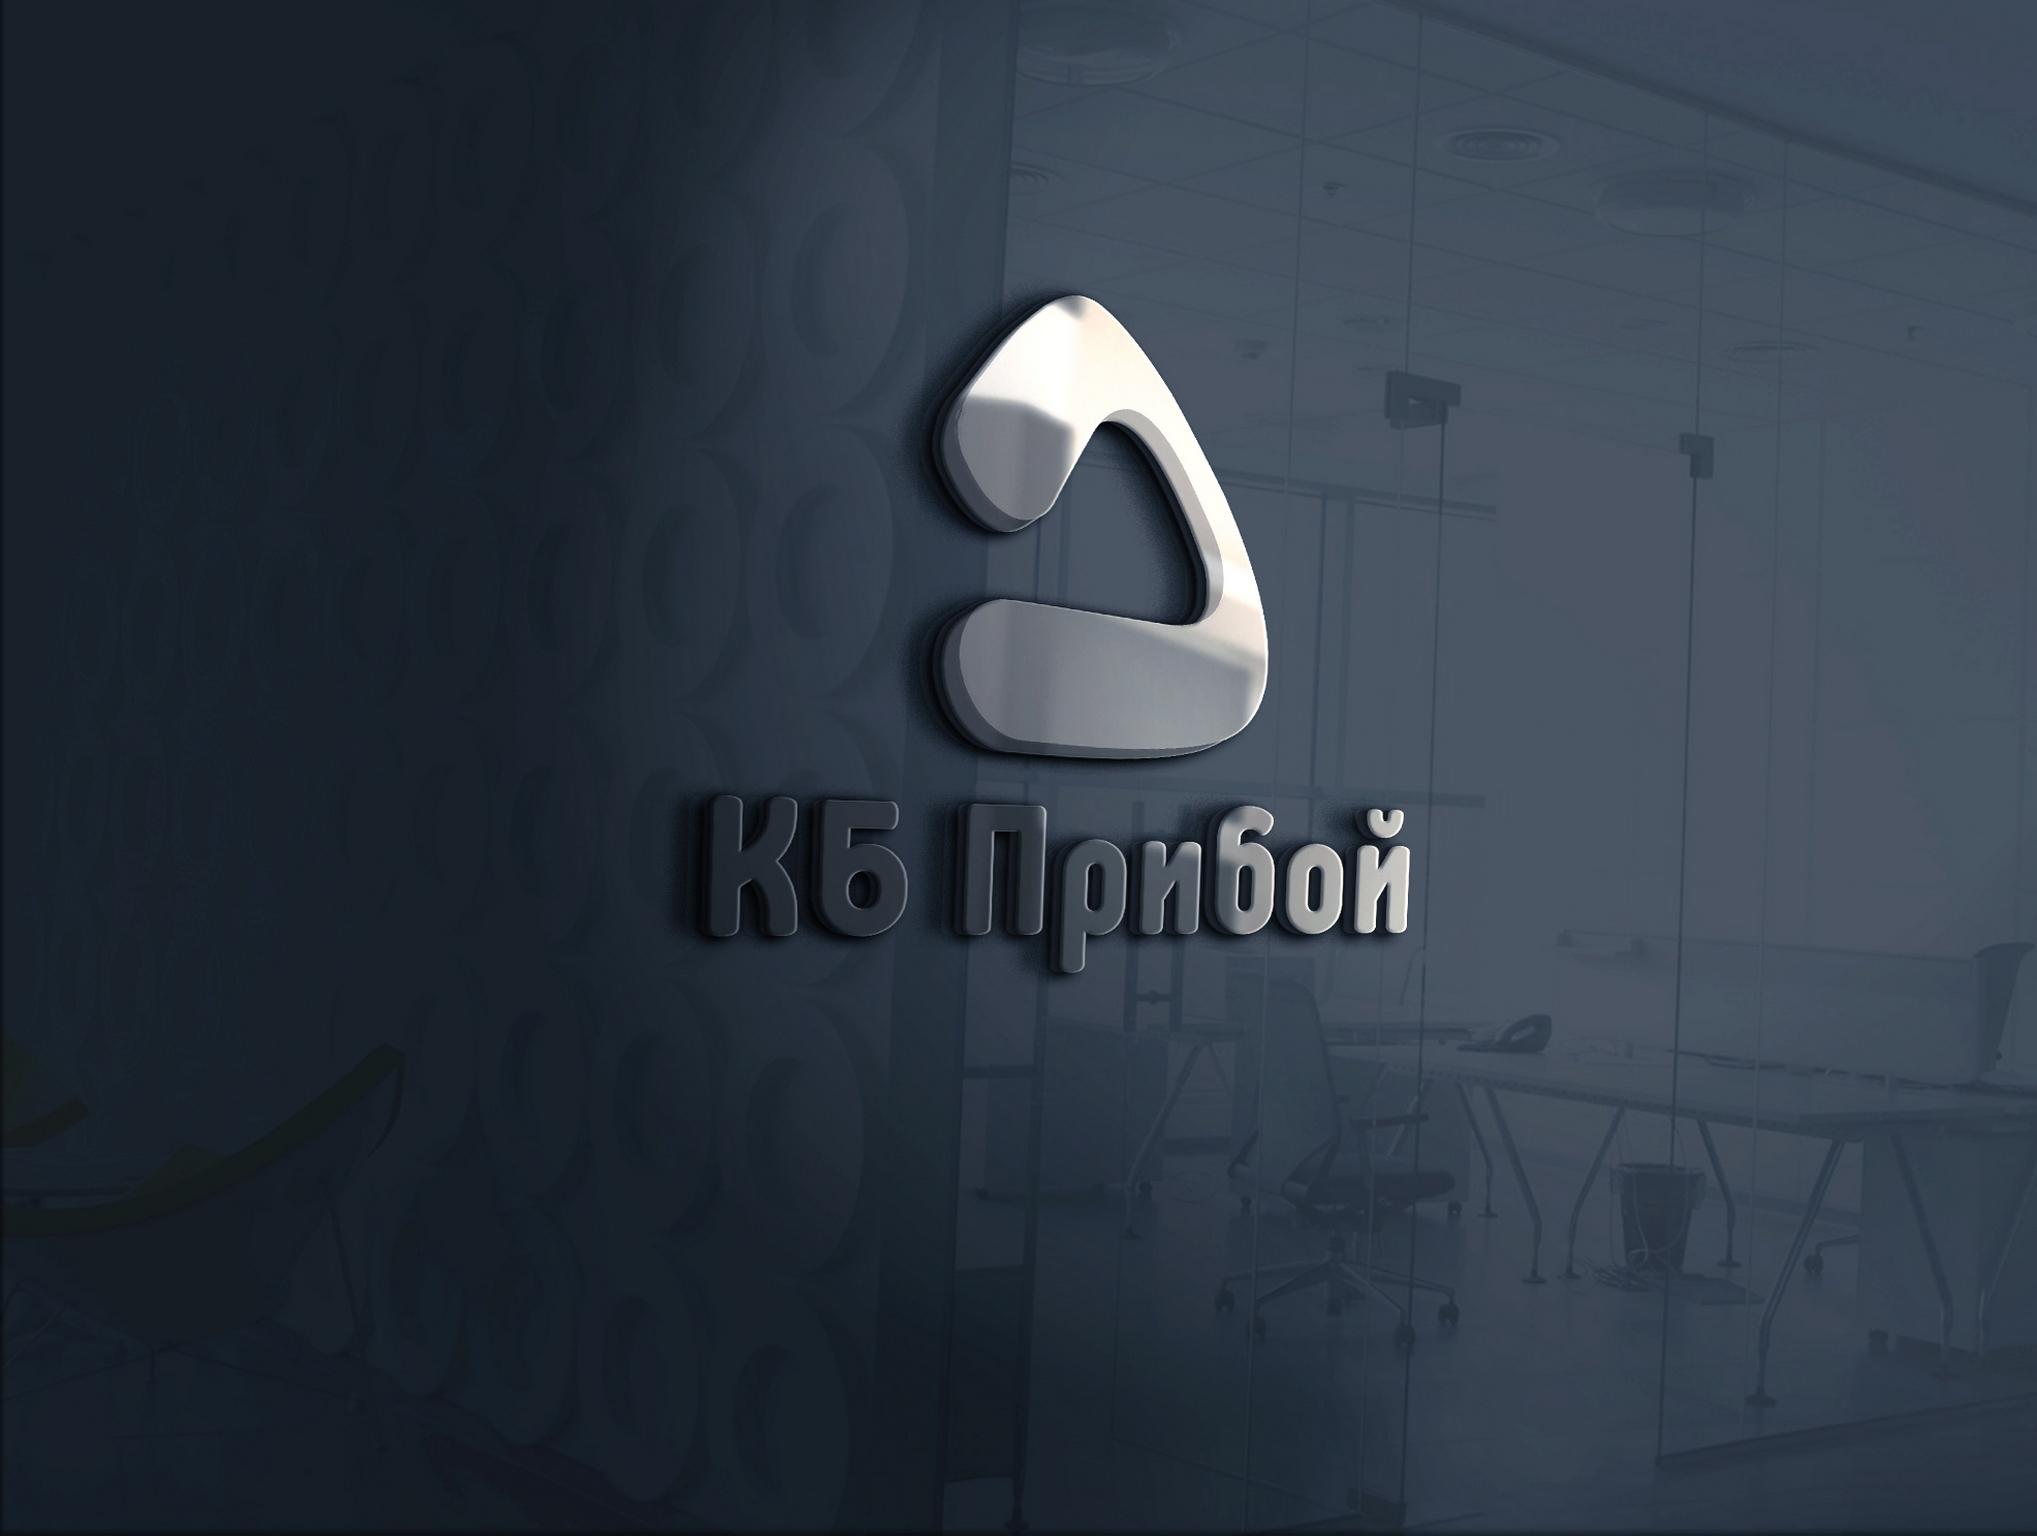 Разработка логотипа и фирменного стиля для КБ Прибой фото f_4365b24da8cbf8d9.jpg